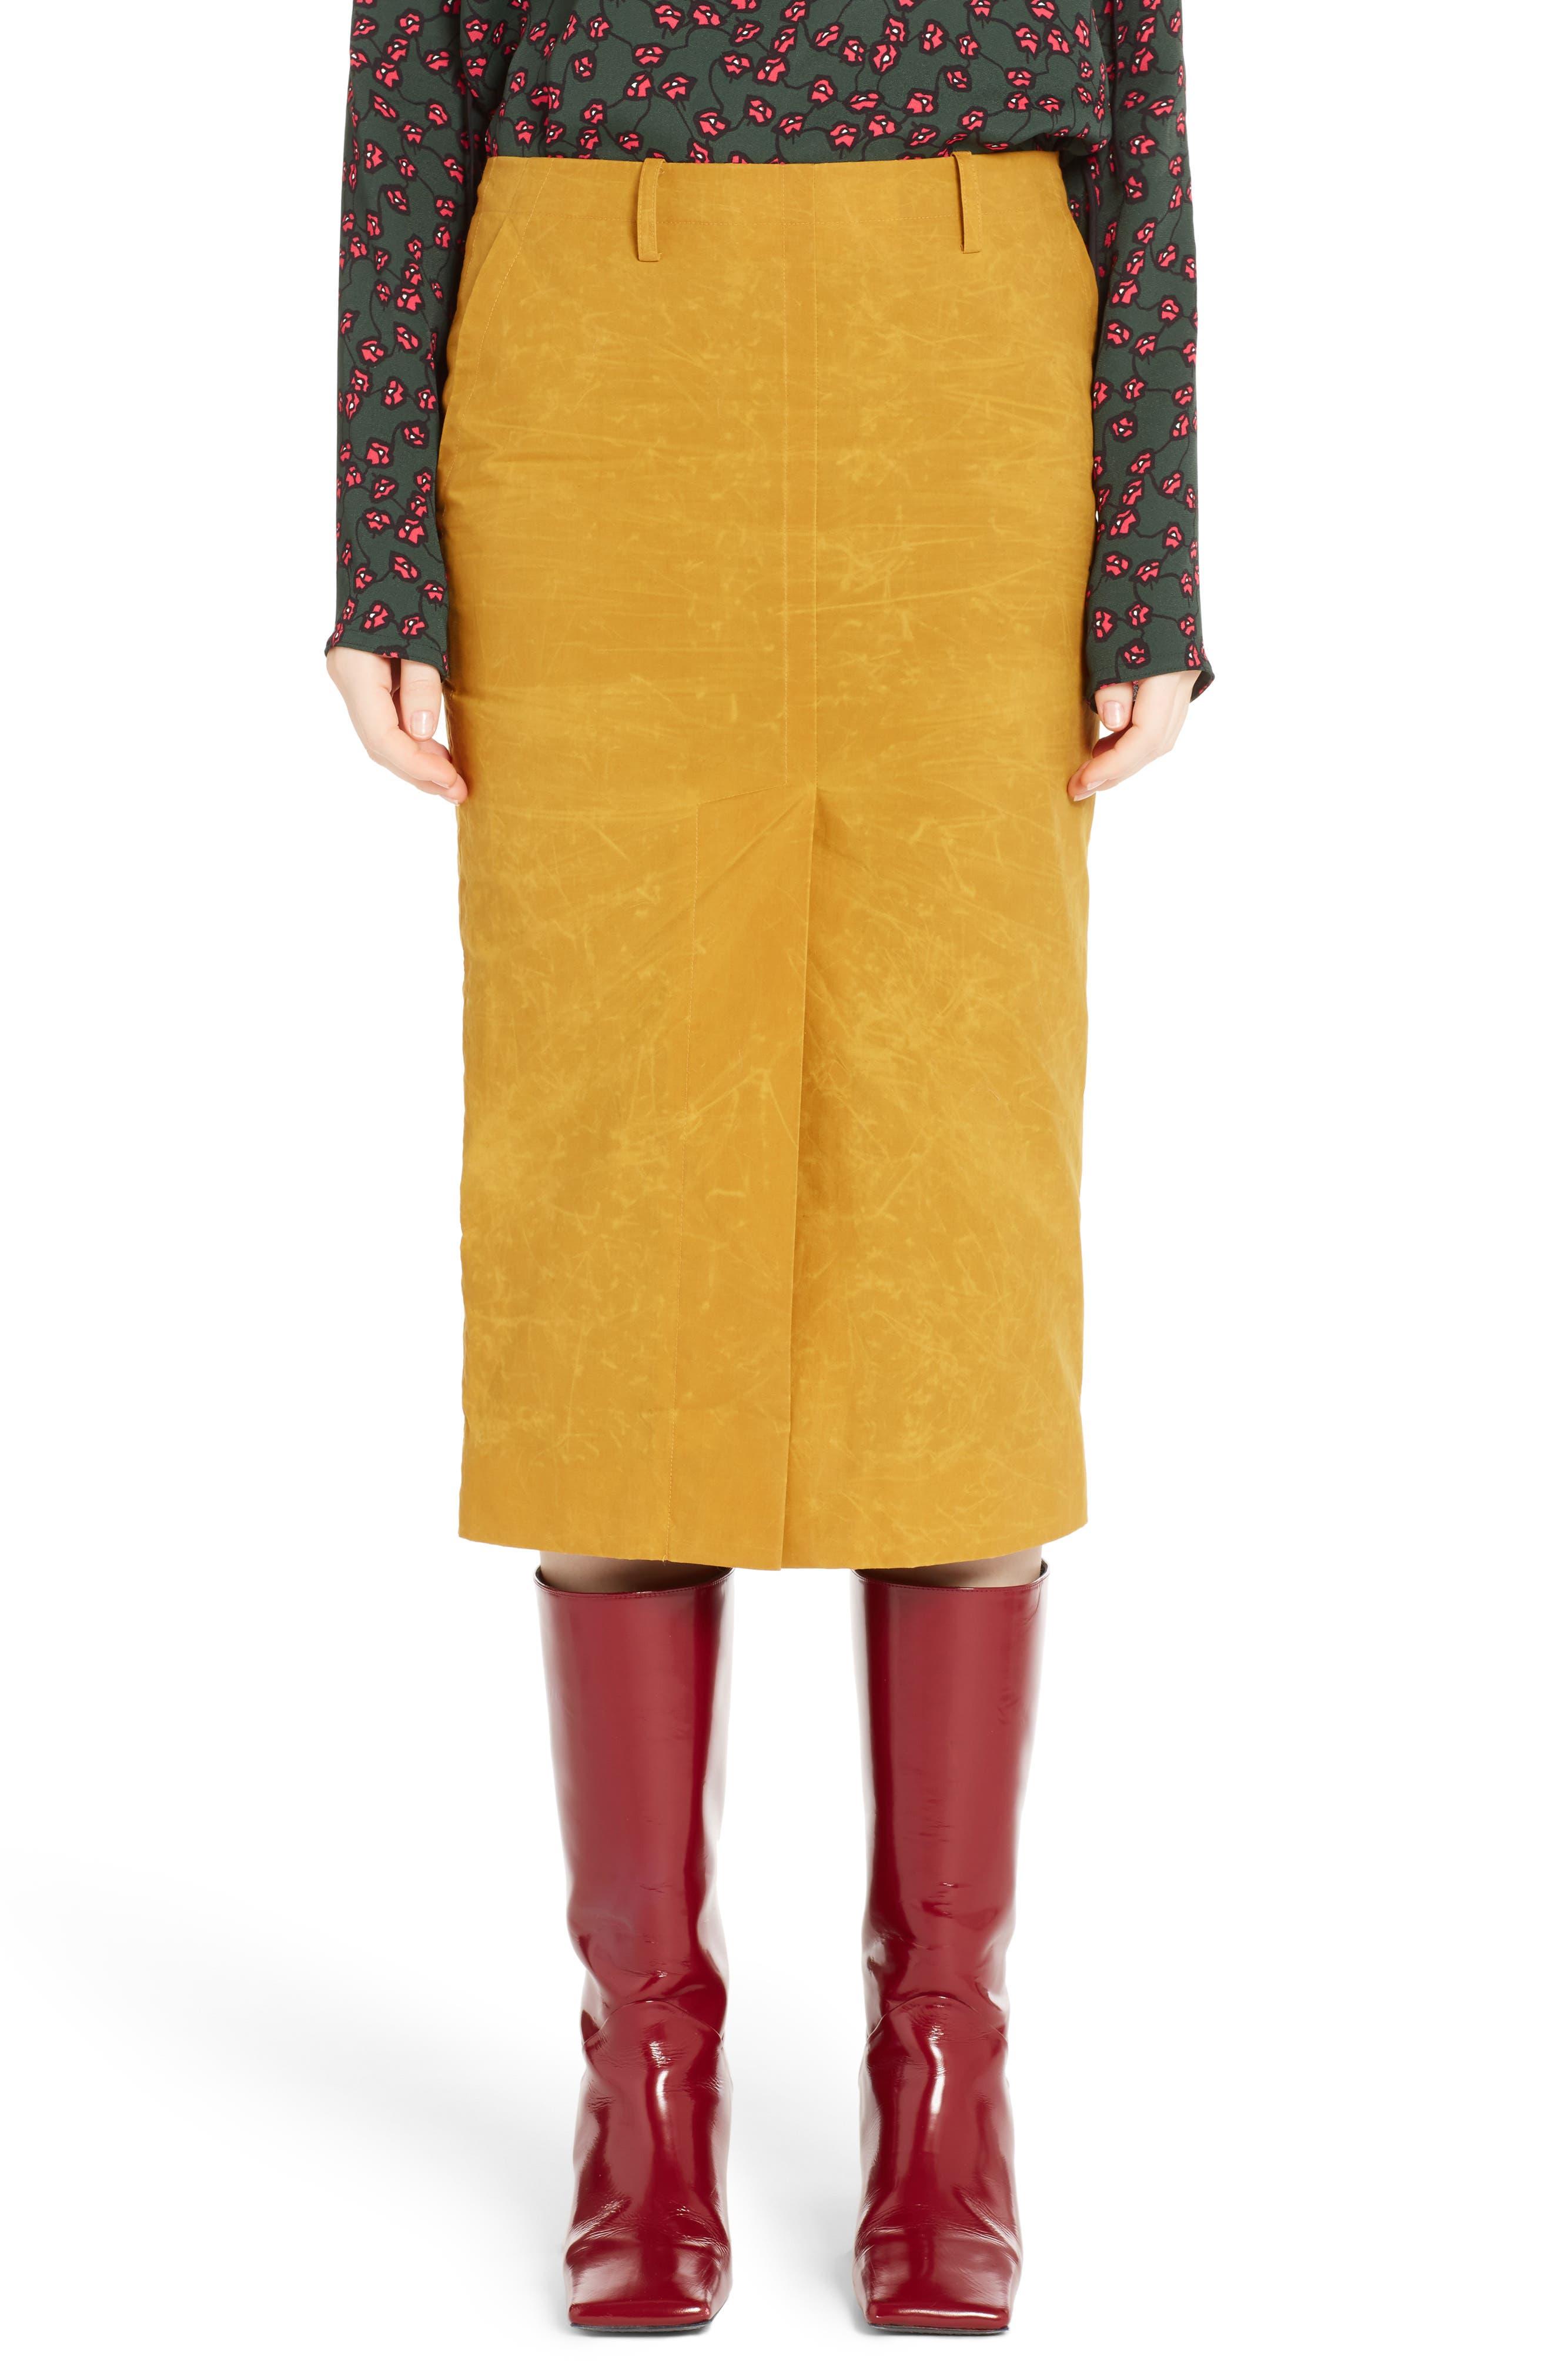 Waxed Cotton Pencil Skirt,                             Main thumbnail 1, color,                             700